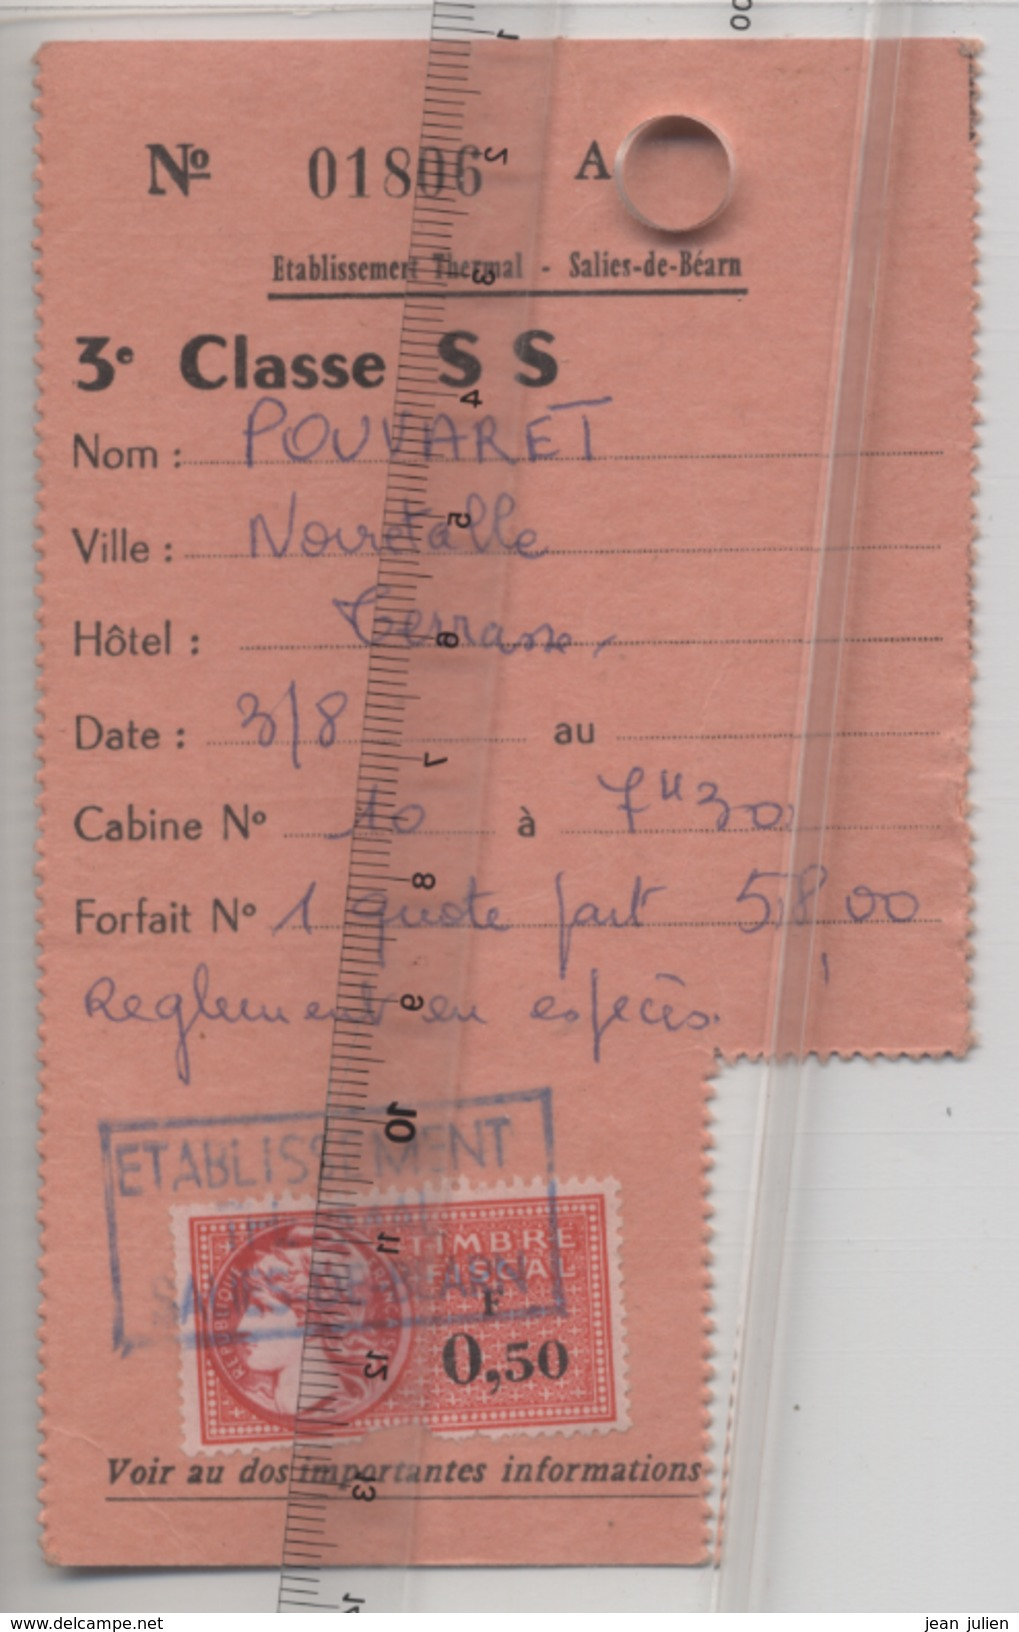 64 - SALIE De BEARN - CARTE DE CURE  - Etablissement Thermal - Curiste - Timbre Fiscal - - Tickets - Entradas